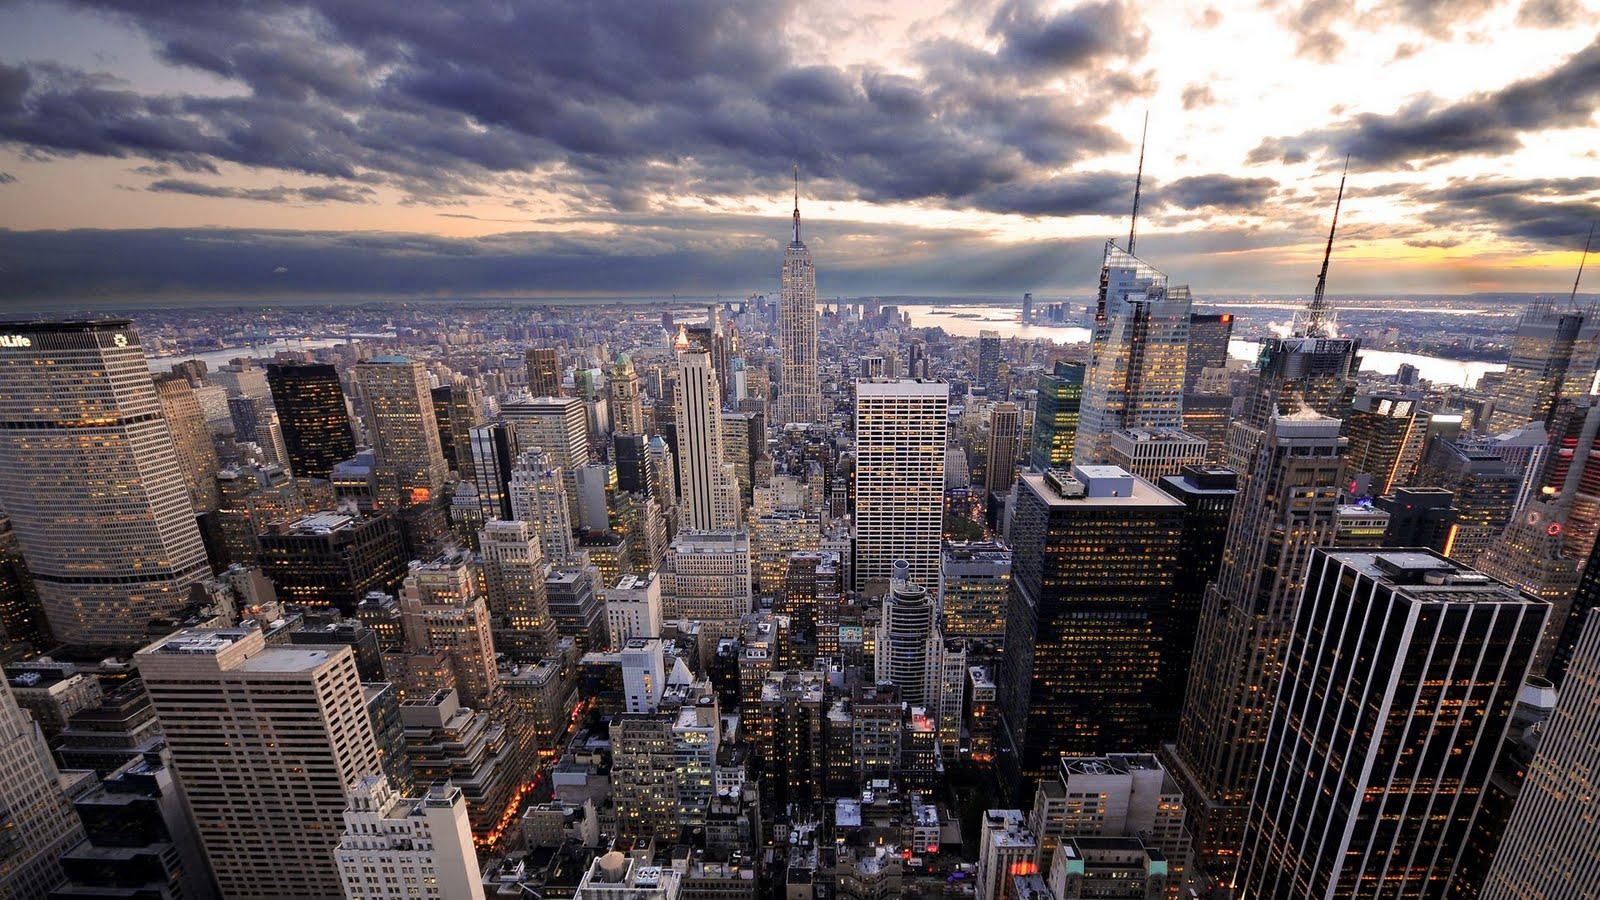 http://4.bp.blogspot.com/-Fs4r9eI0DP0/TldqzNeFeXI/AAAAAAAAAjQ/FElvAuAg2QA/s1600/newyork-1080p-wallpaper.jpg